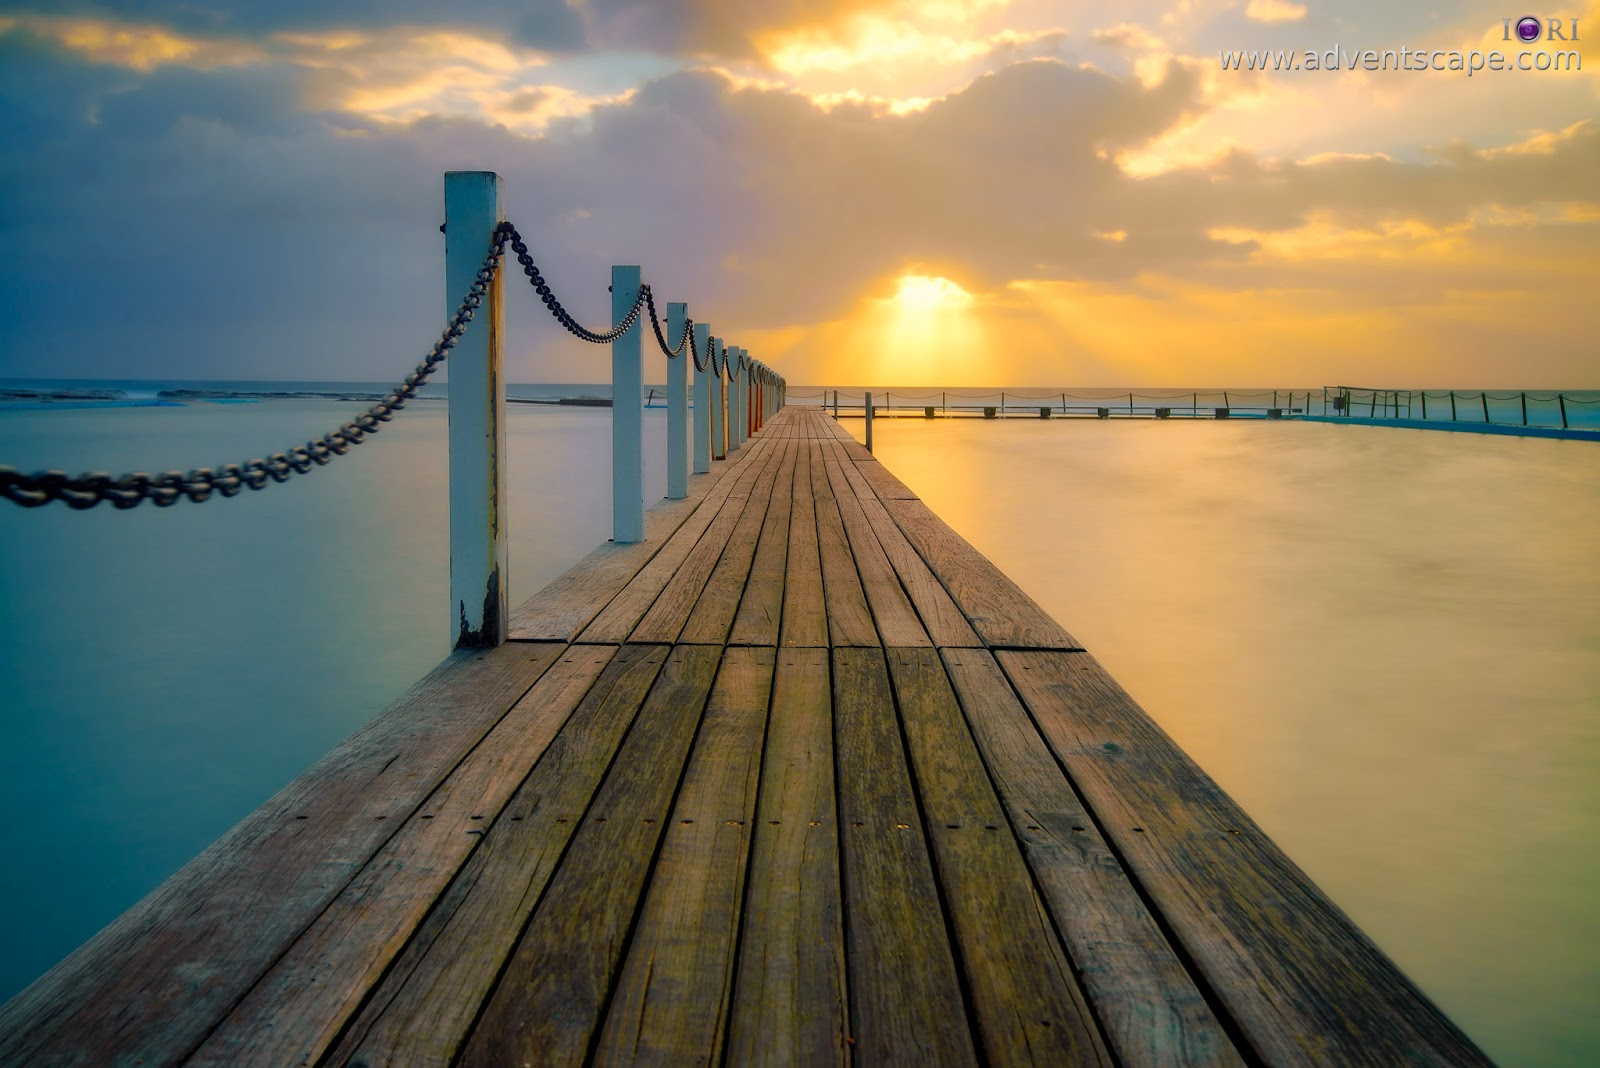 Australia, Australian Landscape Photographer, landscape, Narrabeen, New South Wales, Northern Beaches, NSW, Philip Avellana, rock pool, seascape, sunray